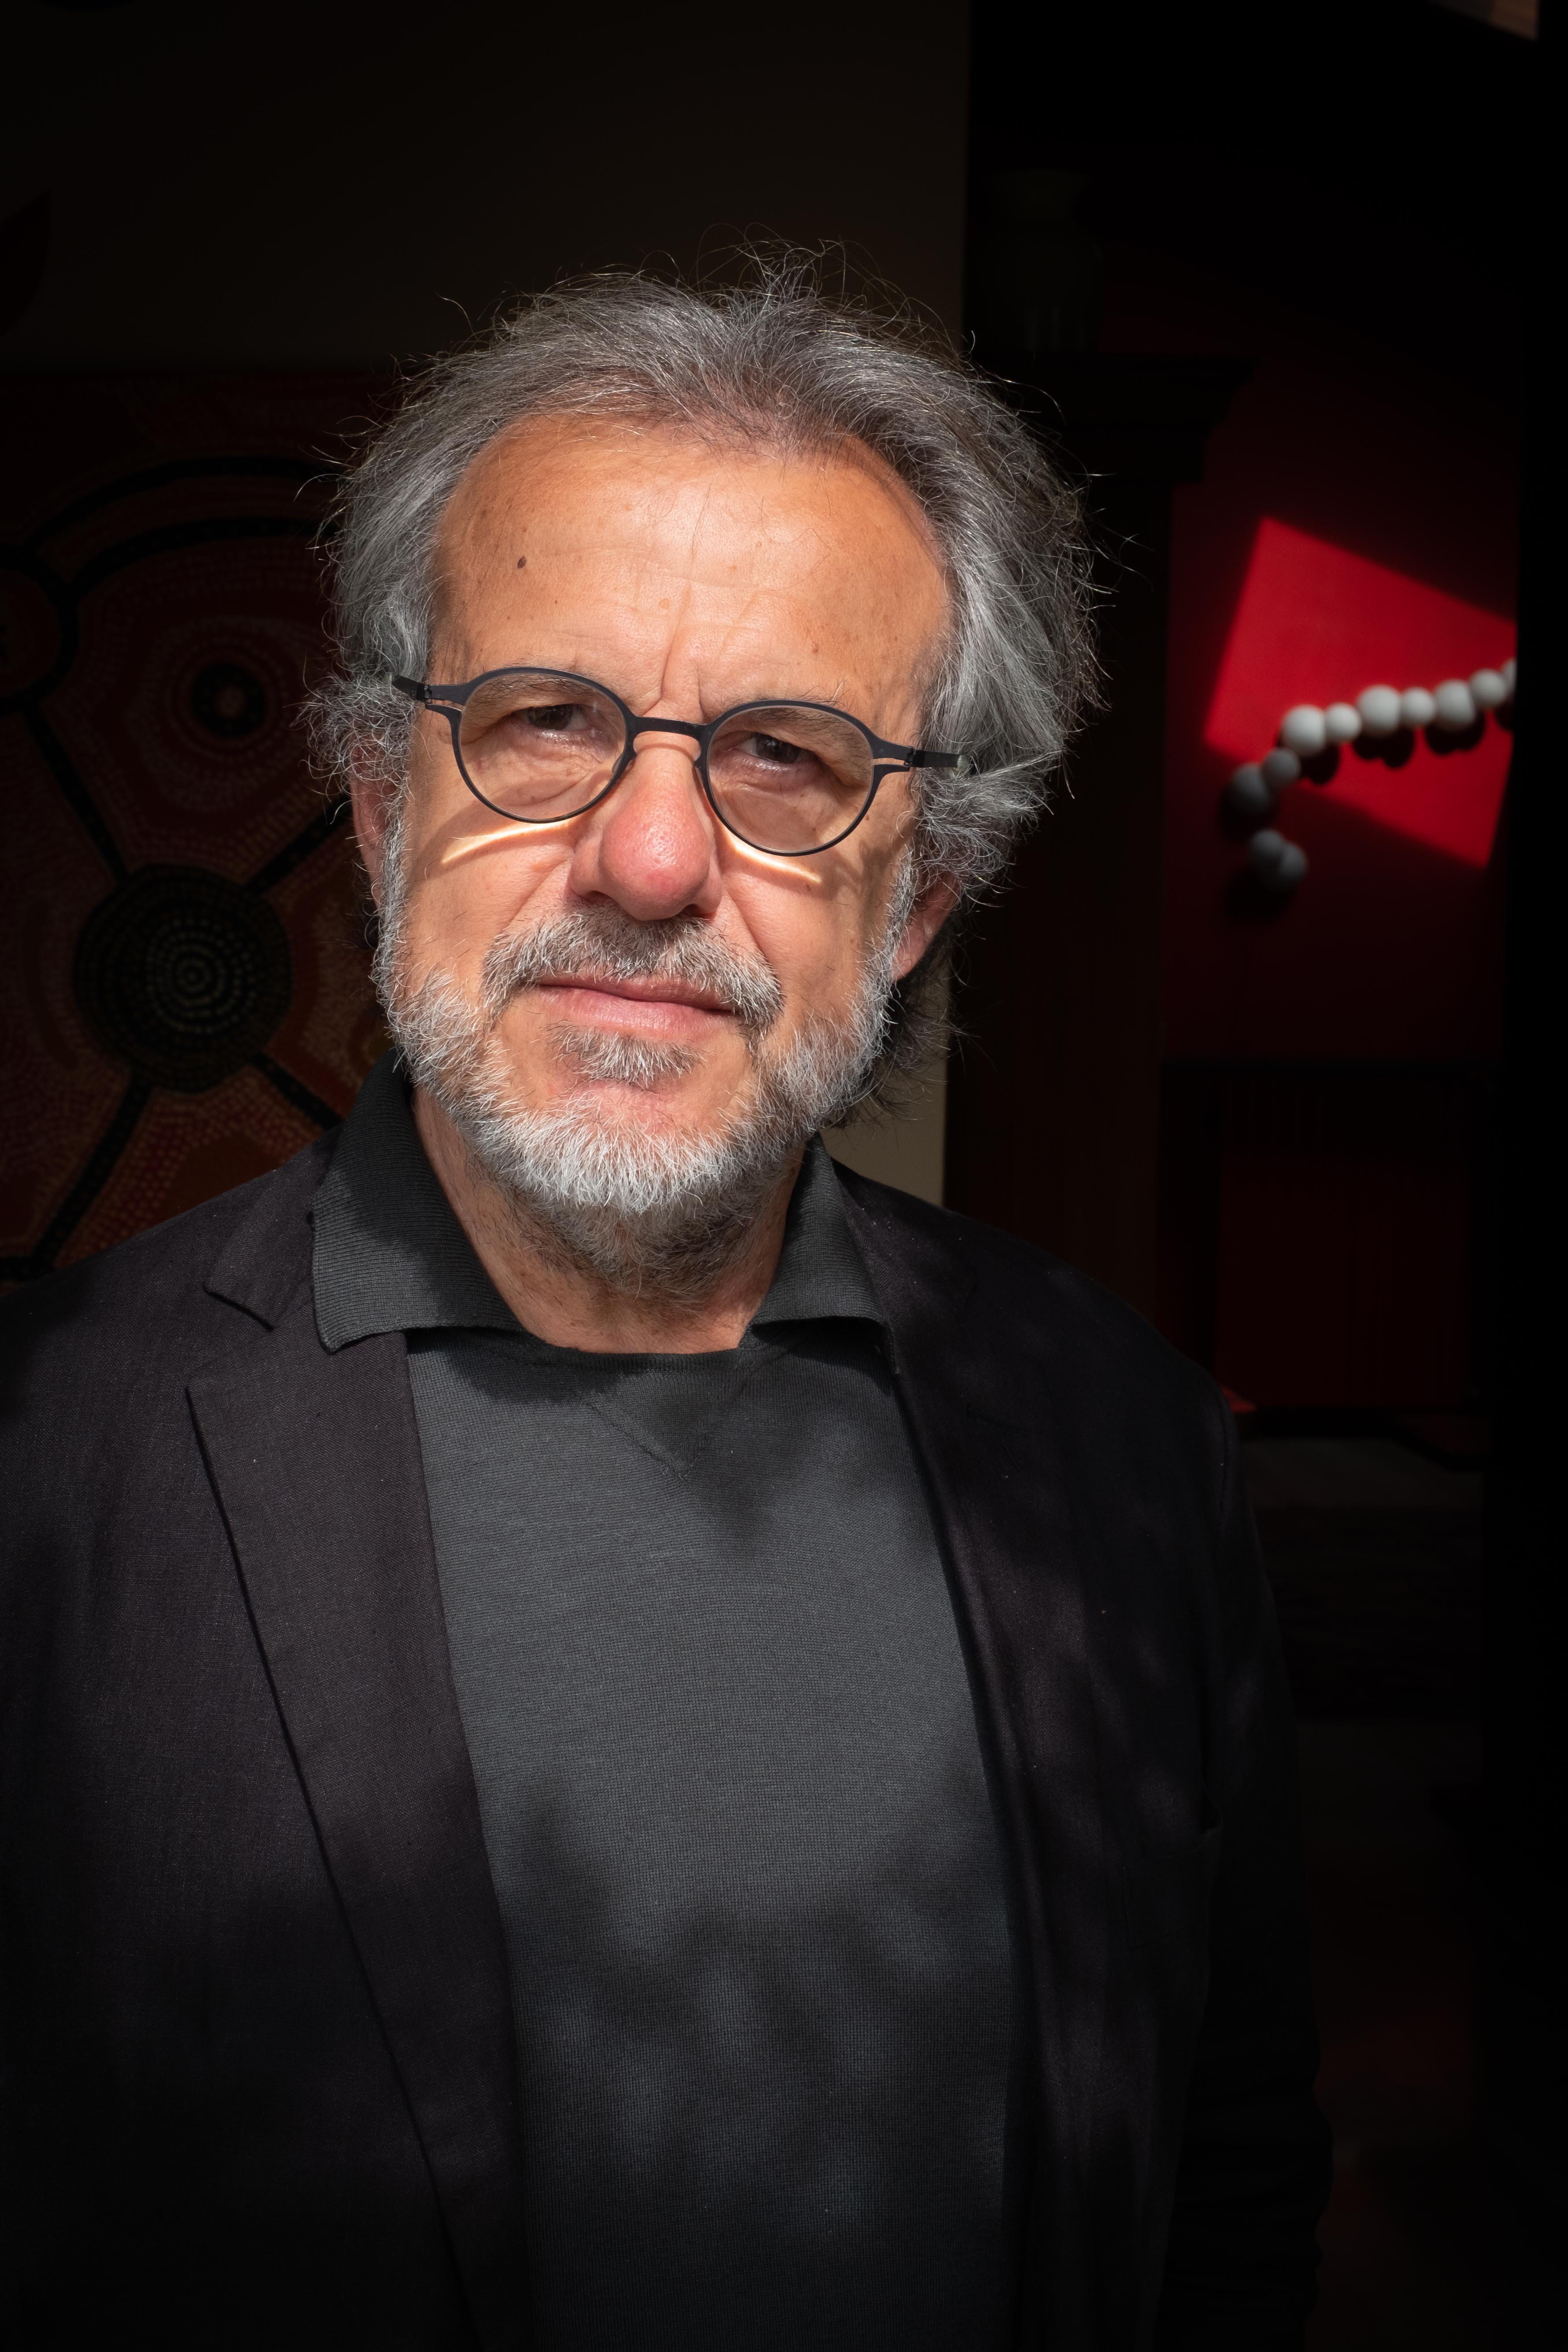 MarcoPagani